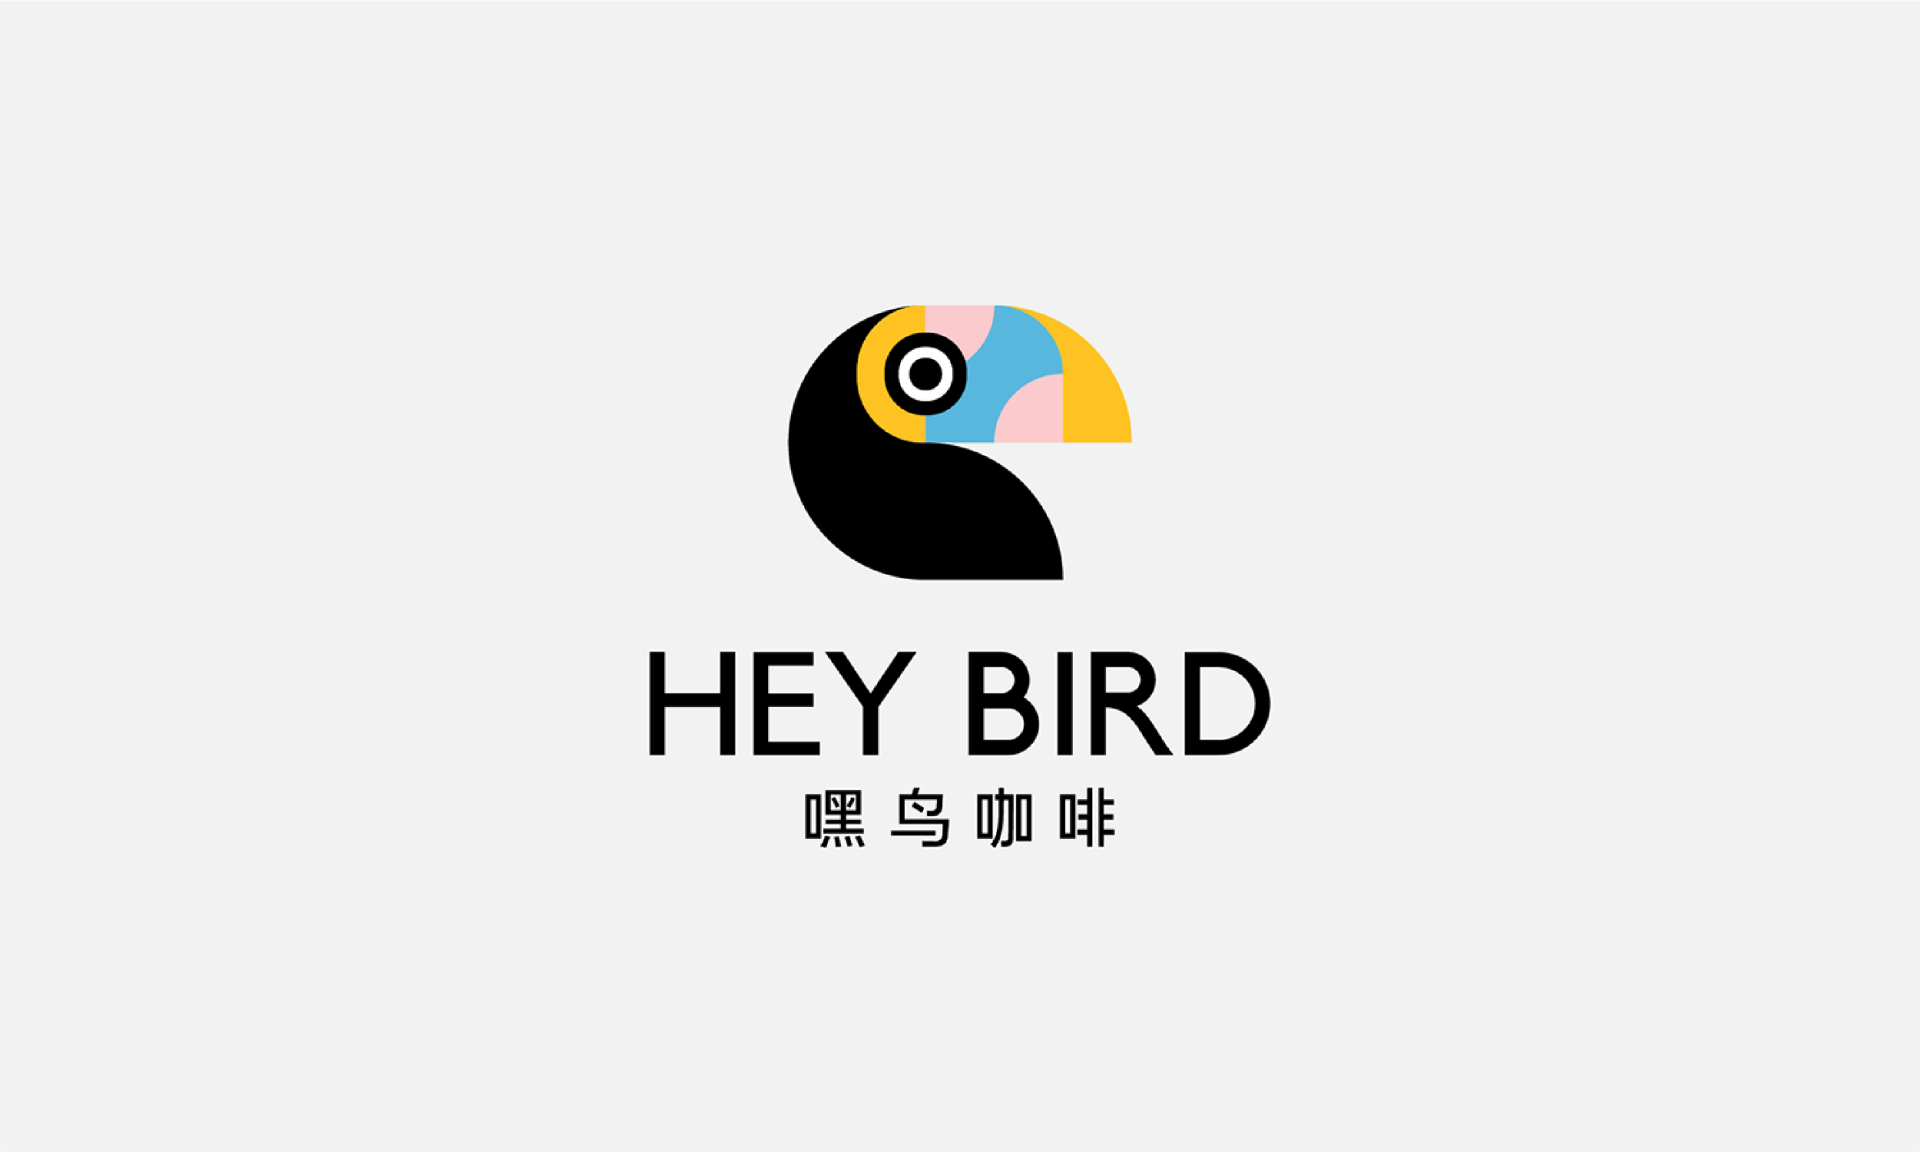 heybird_画板 1 副本